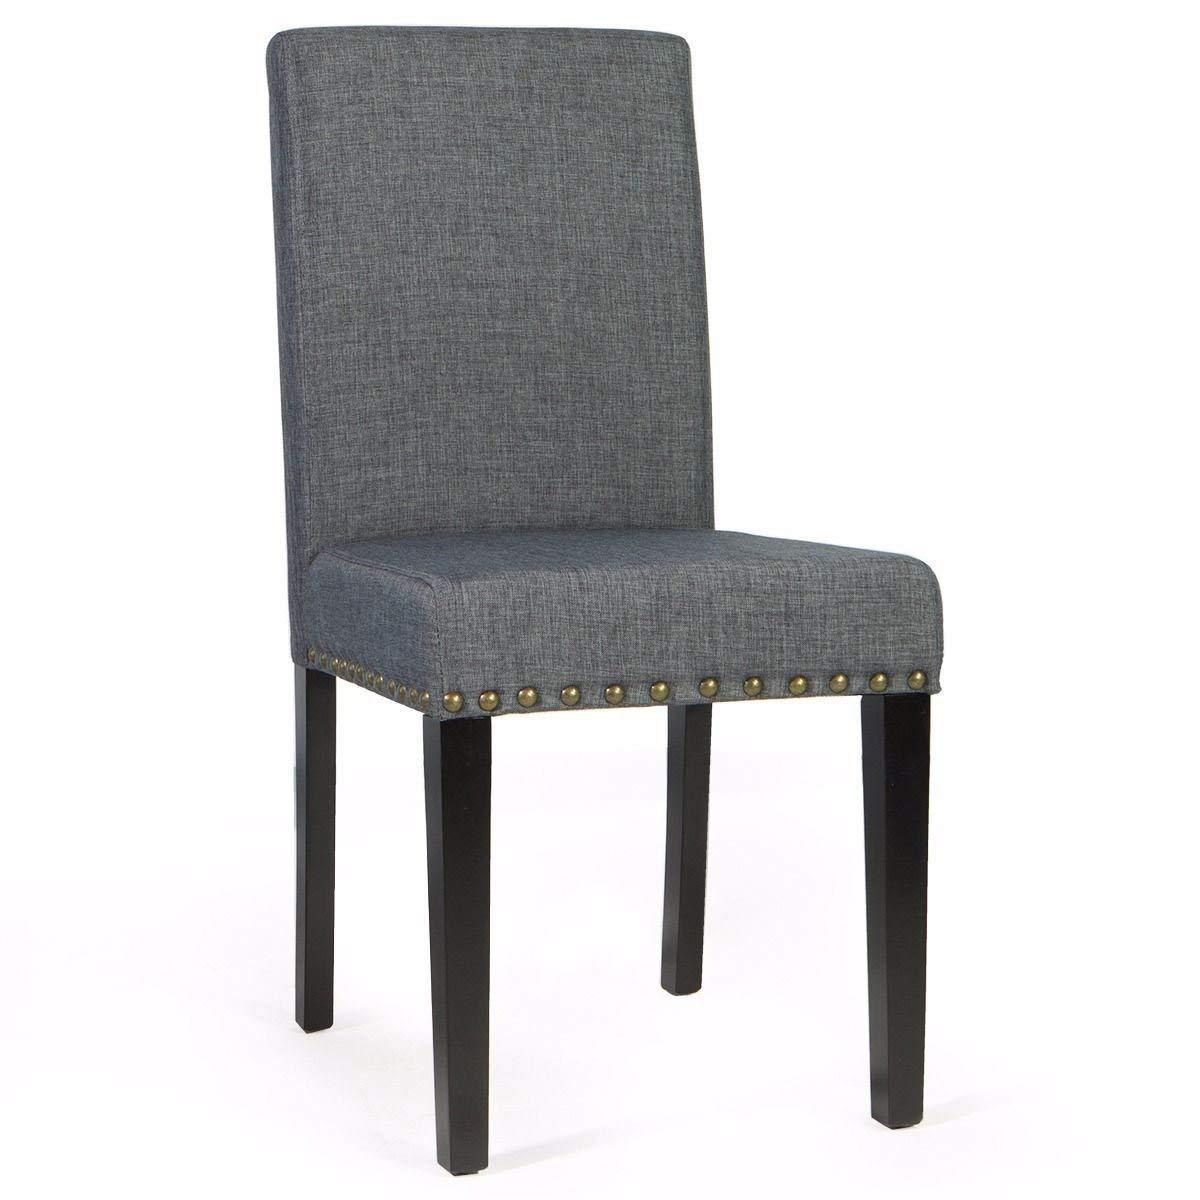 KCHEX>1 Pair Sleek Parson Modern Gray Nailhead Trim Dining Chairs Barton Furniture>The Barton Upholstered Dining Chairs with Nailheads add Beauty to Any Table.